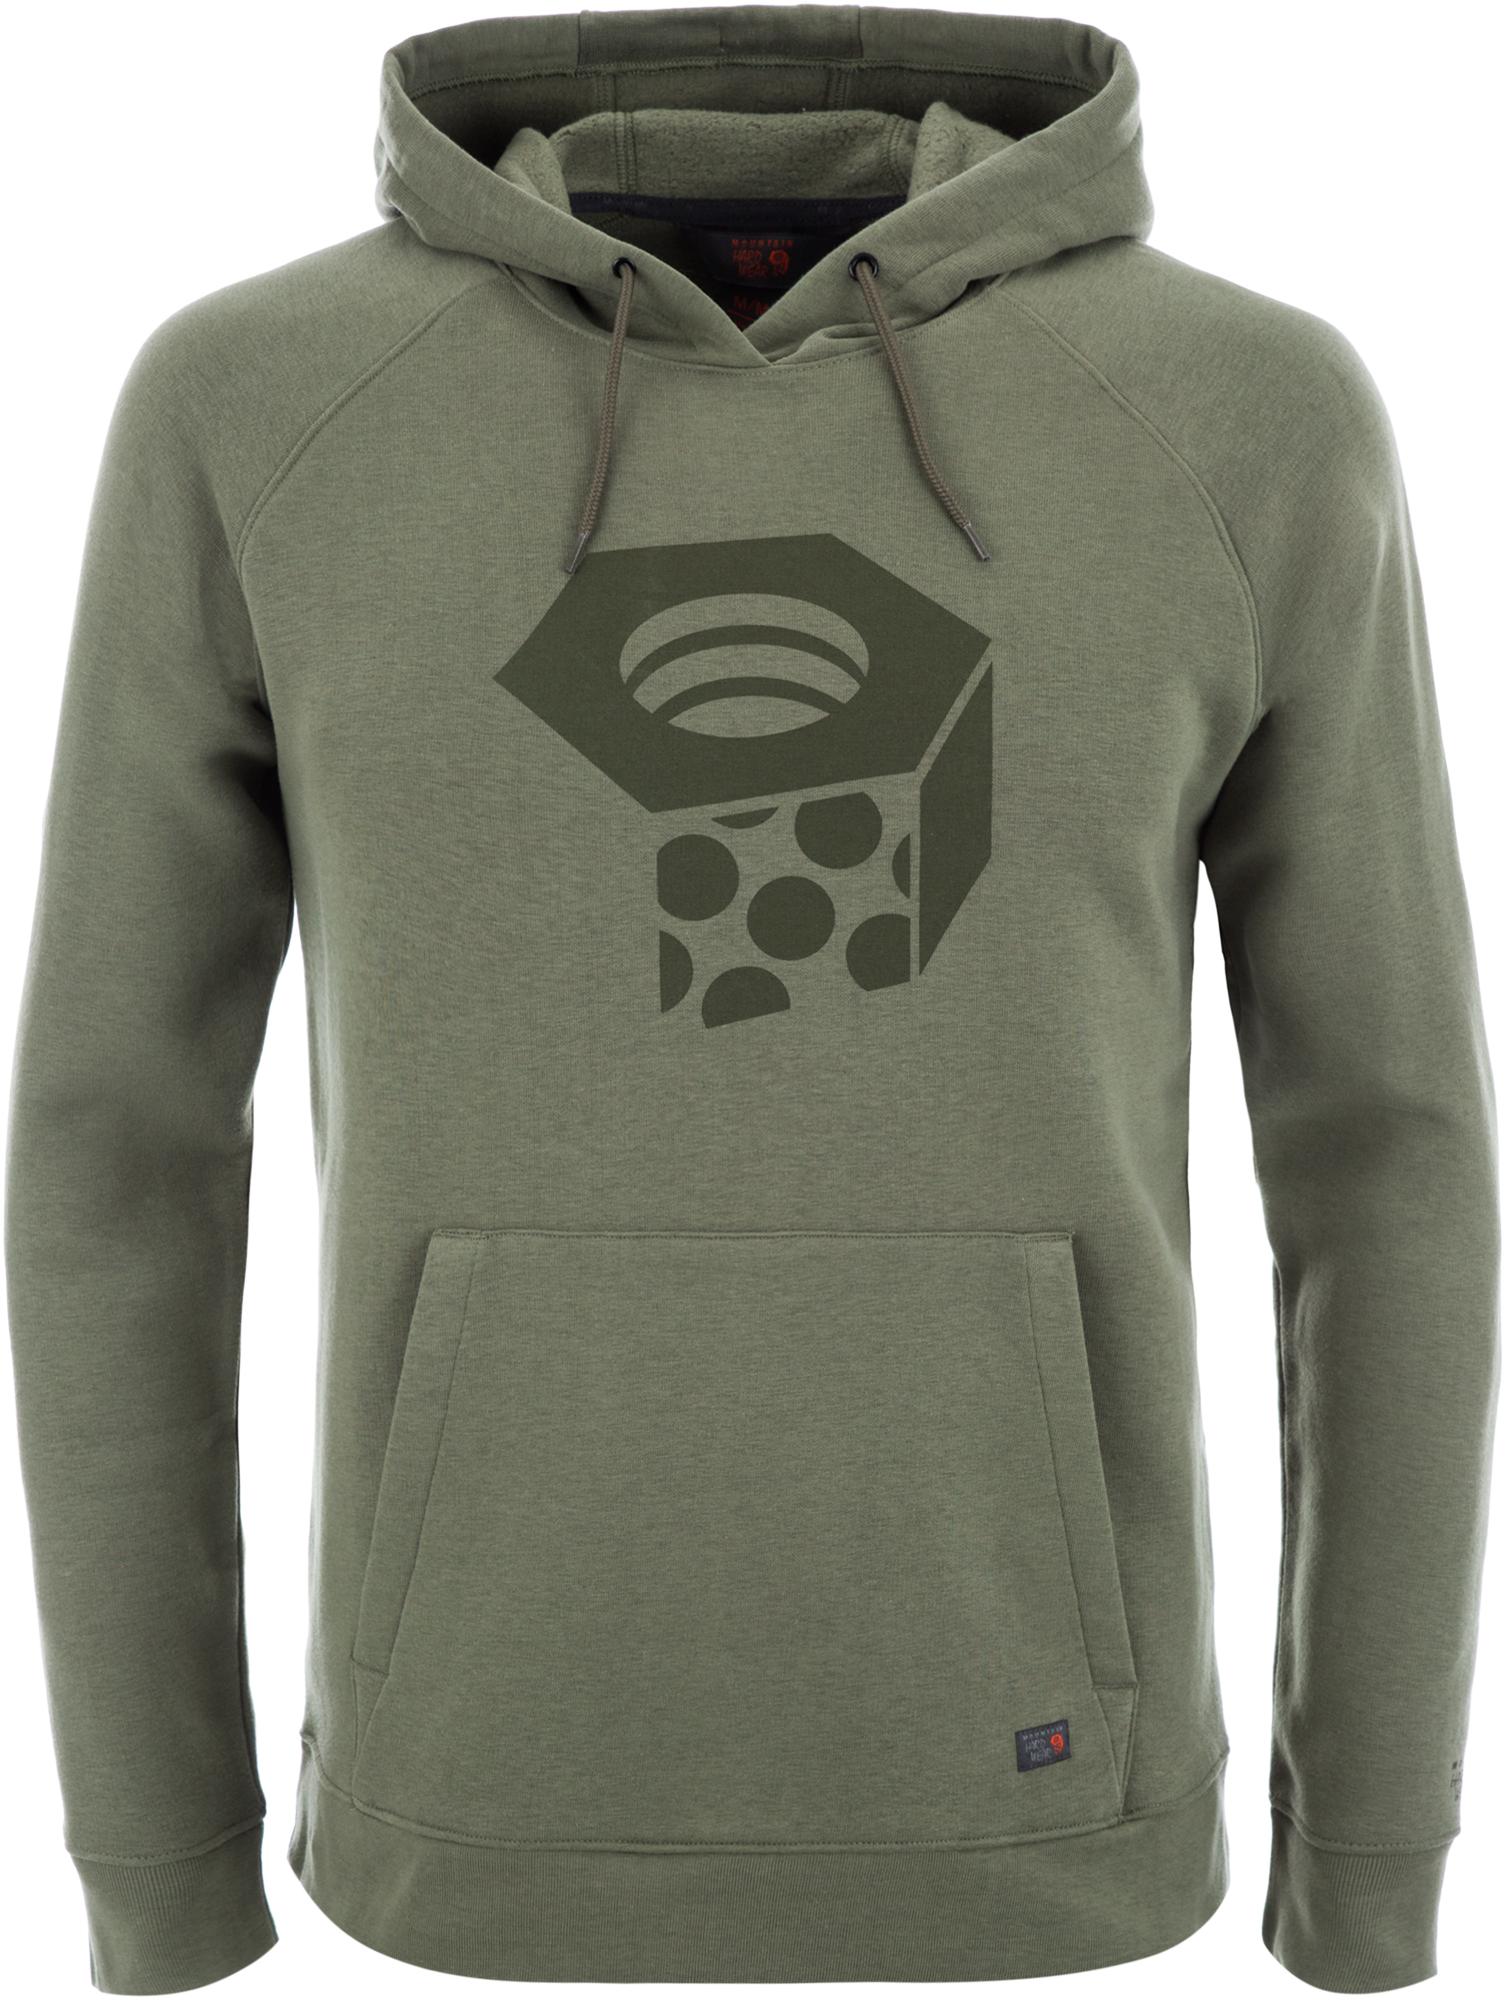 Mountain Hardwear Худи мужская Logo Hardwear, размер 56